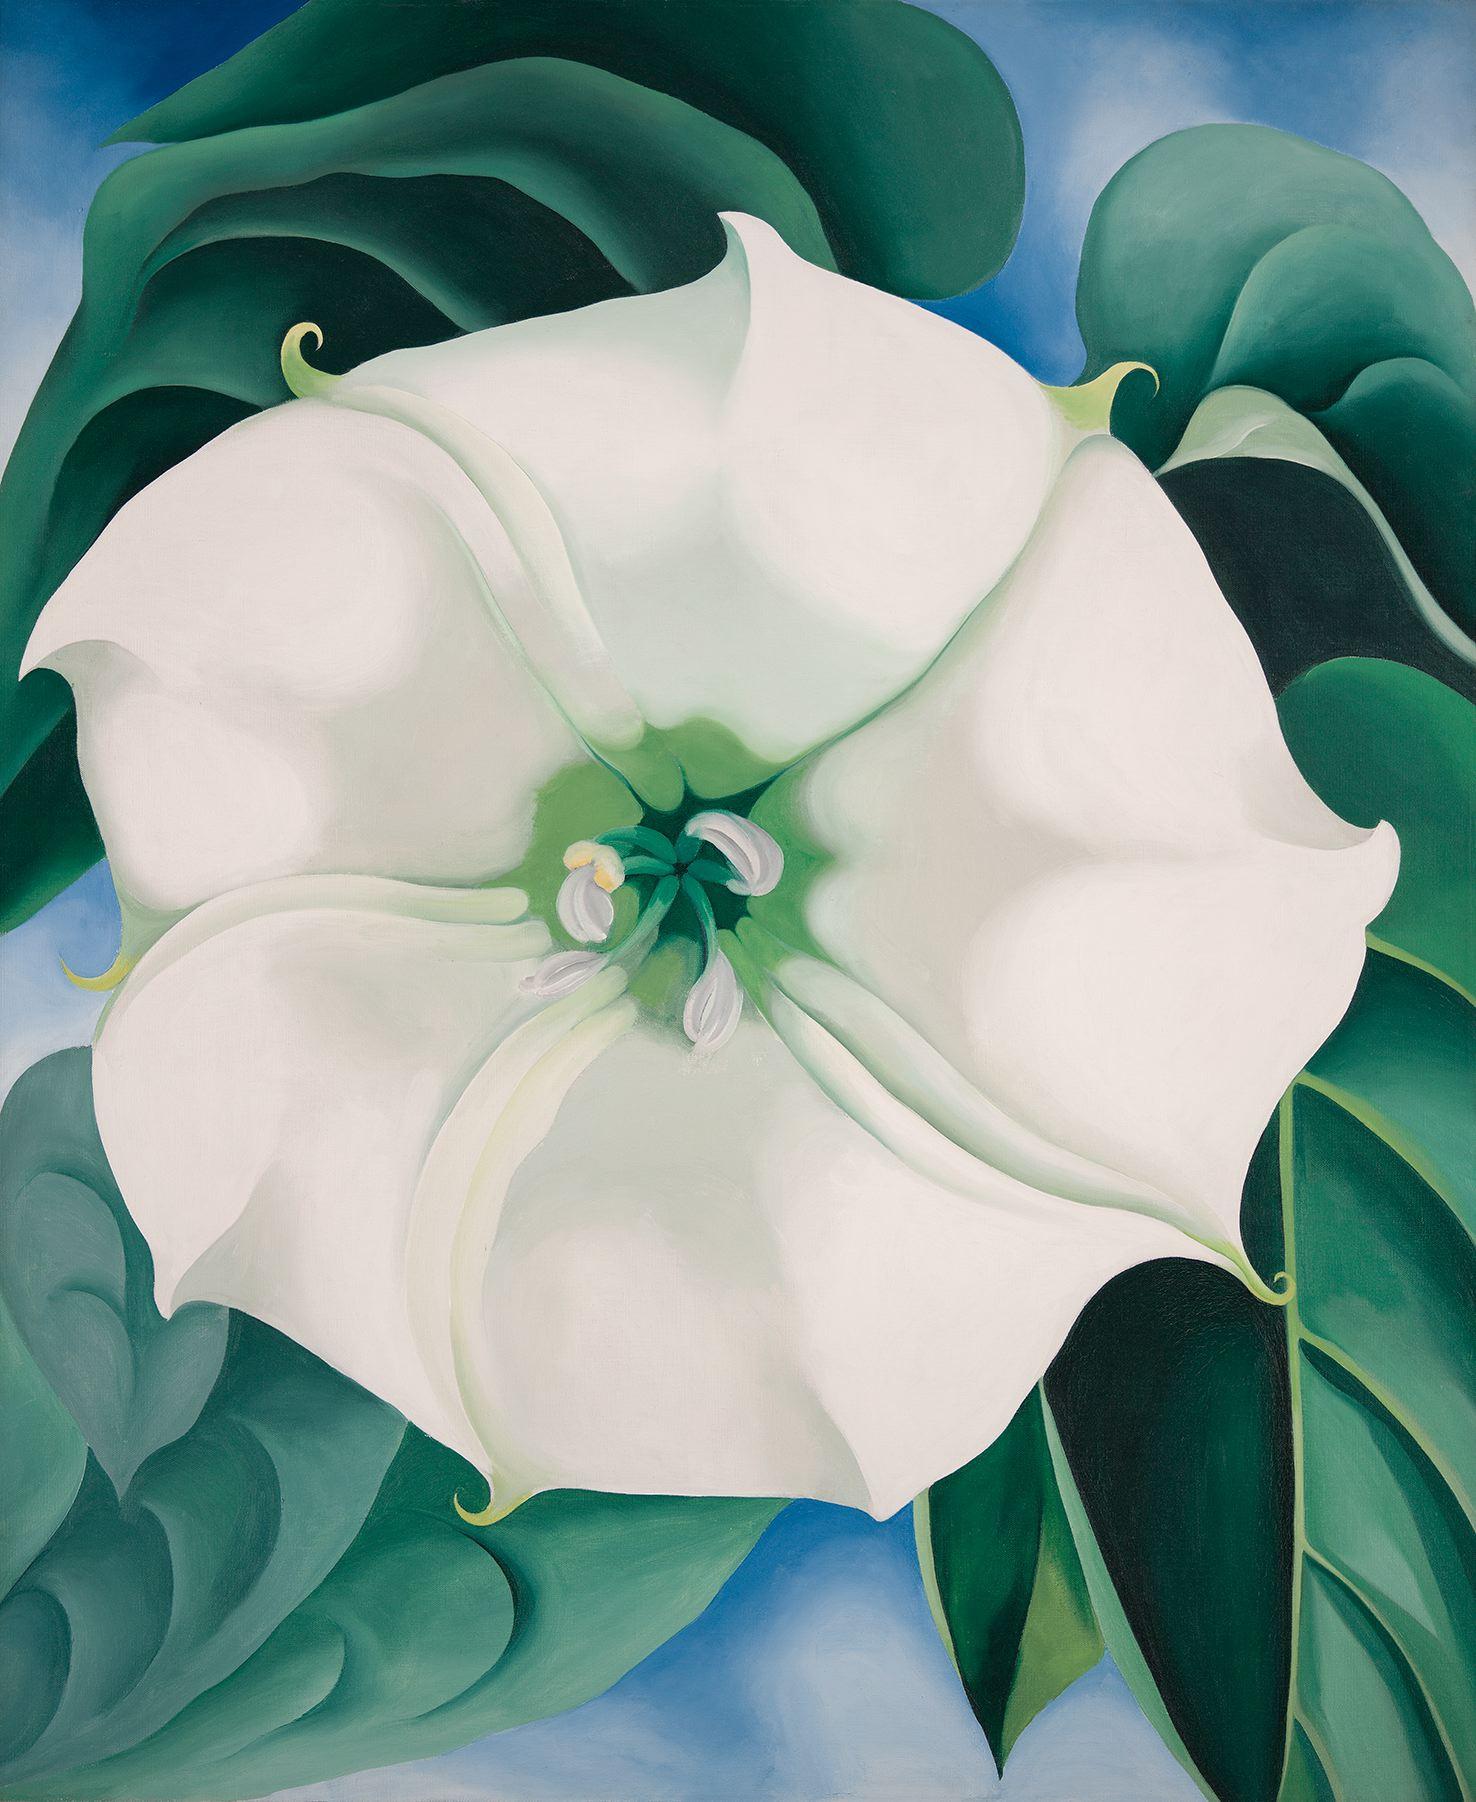 Georgia O'Keeffe Jimson Weed/White Flower No. 1, 1932